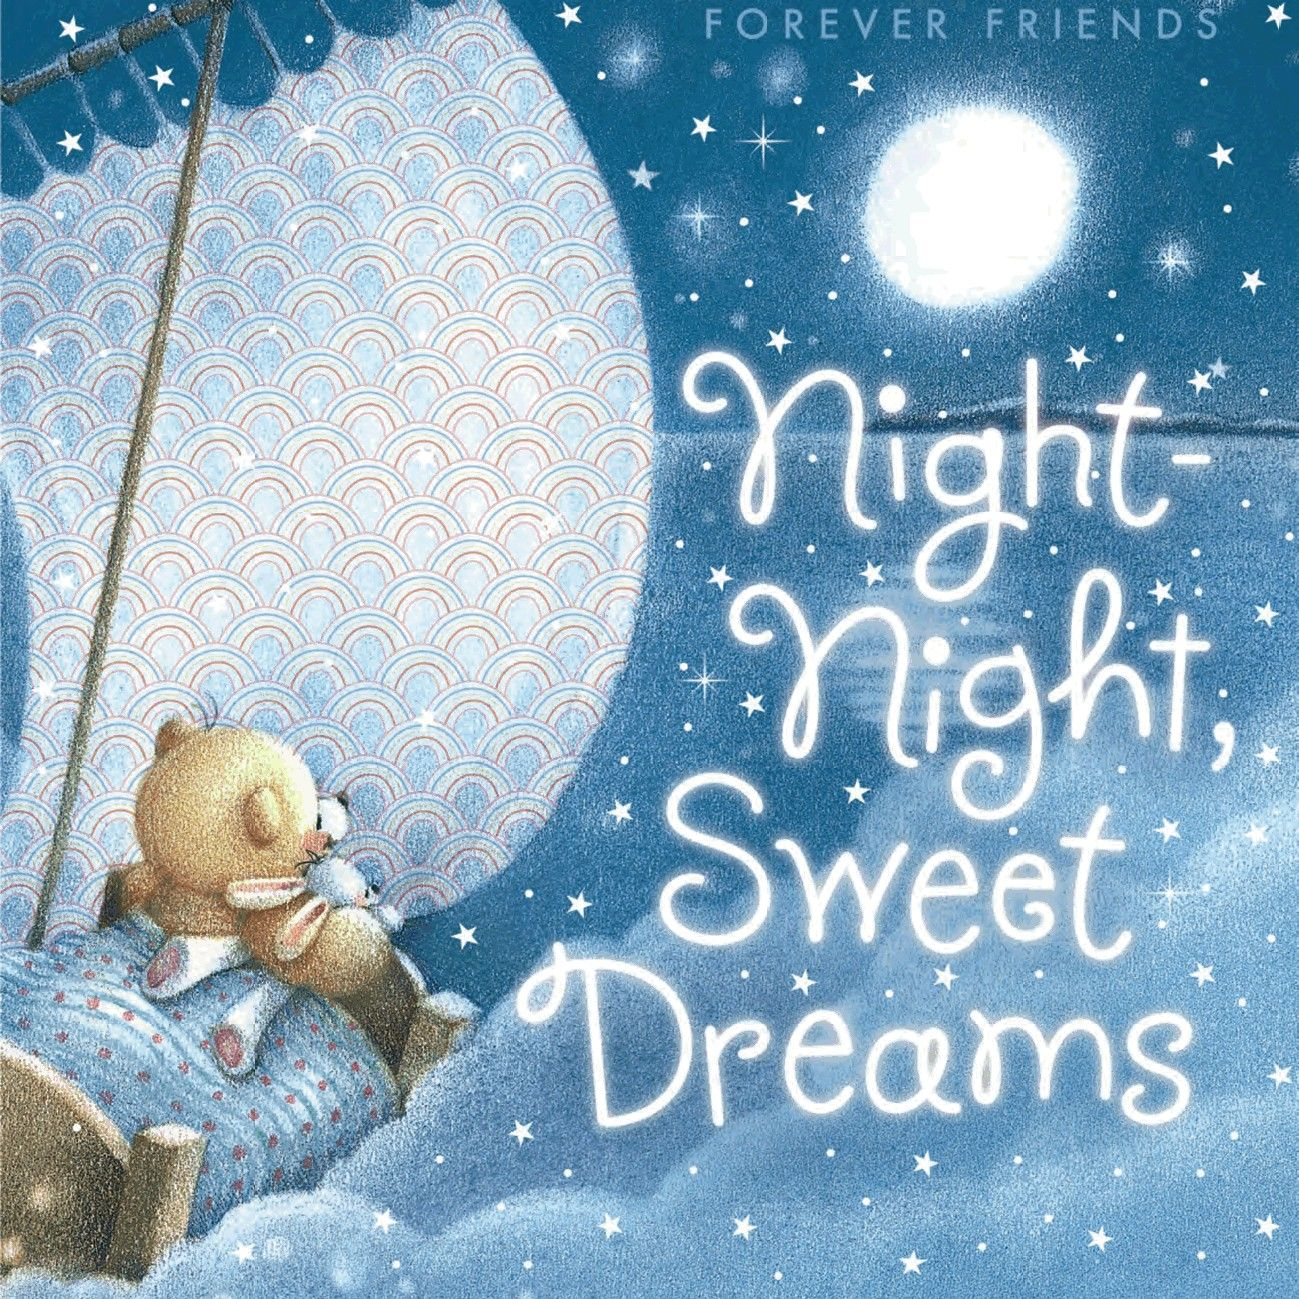 Night Night Sweet Dreams Cute Good Night Good Night Wallpaper Good Night Wishes